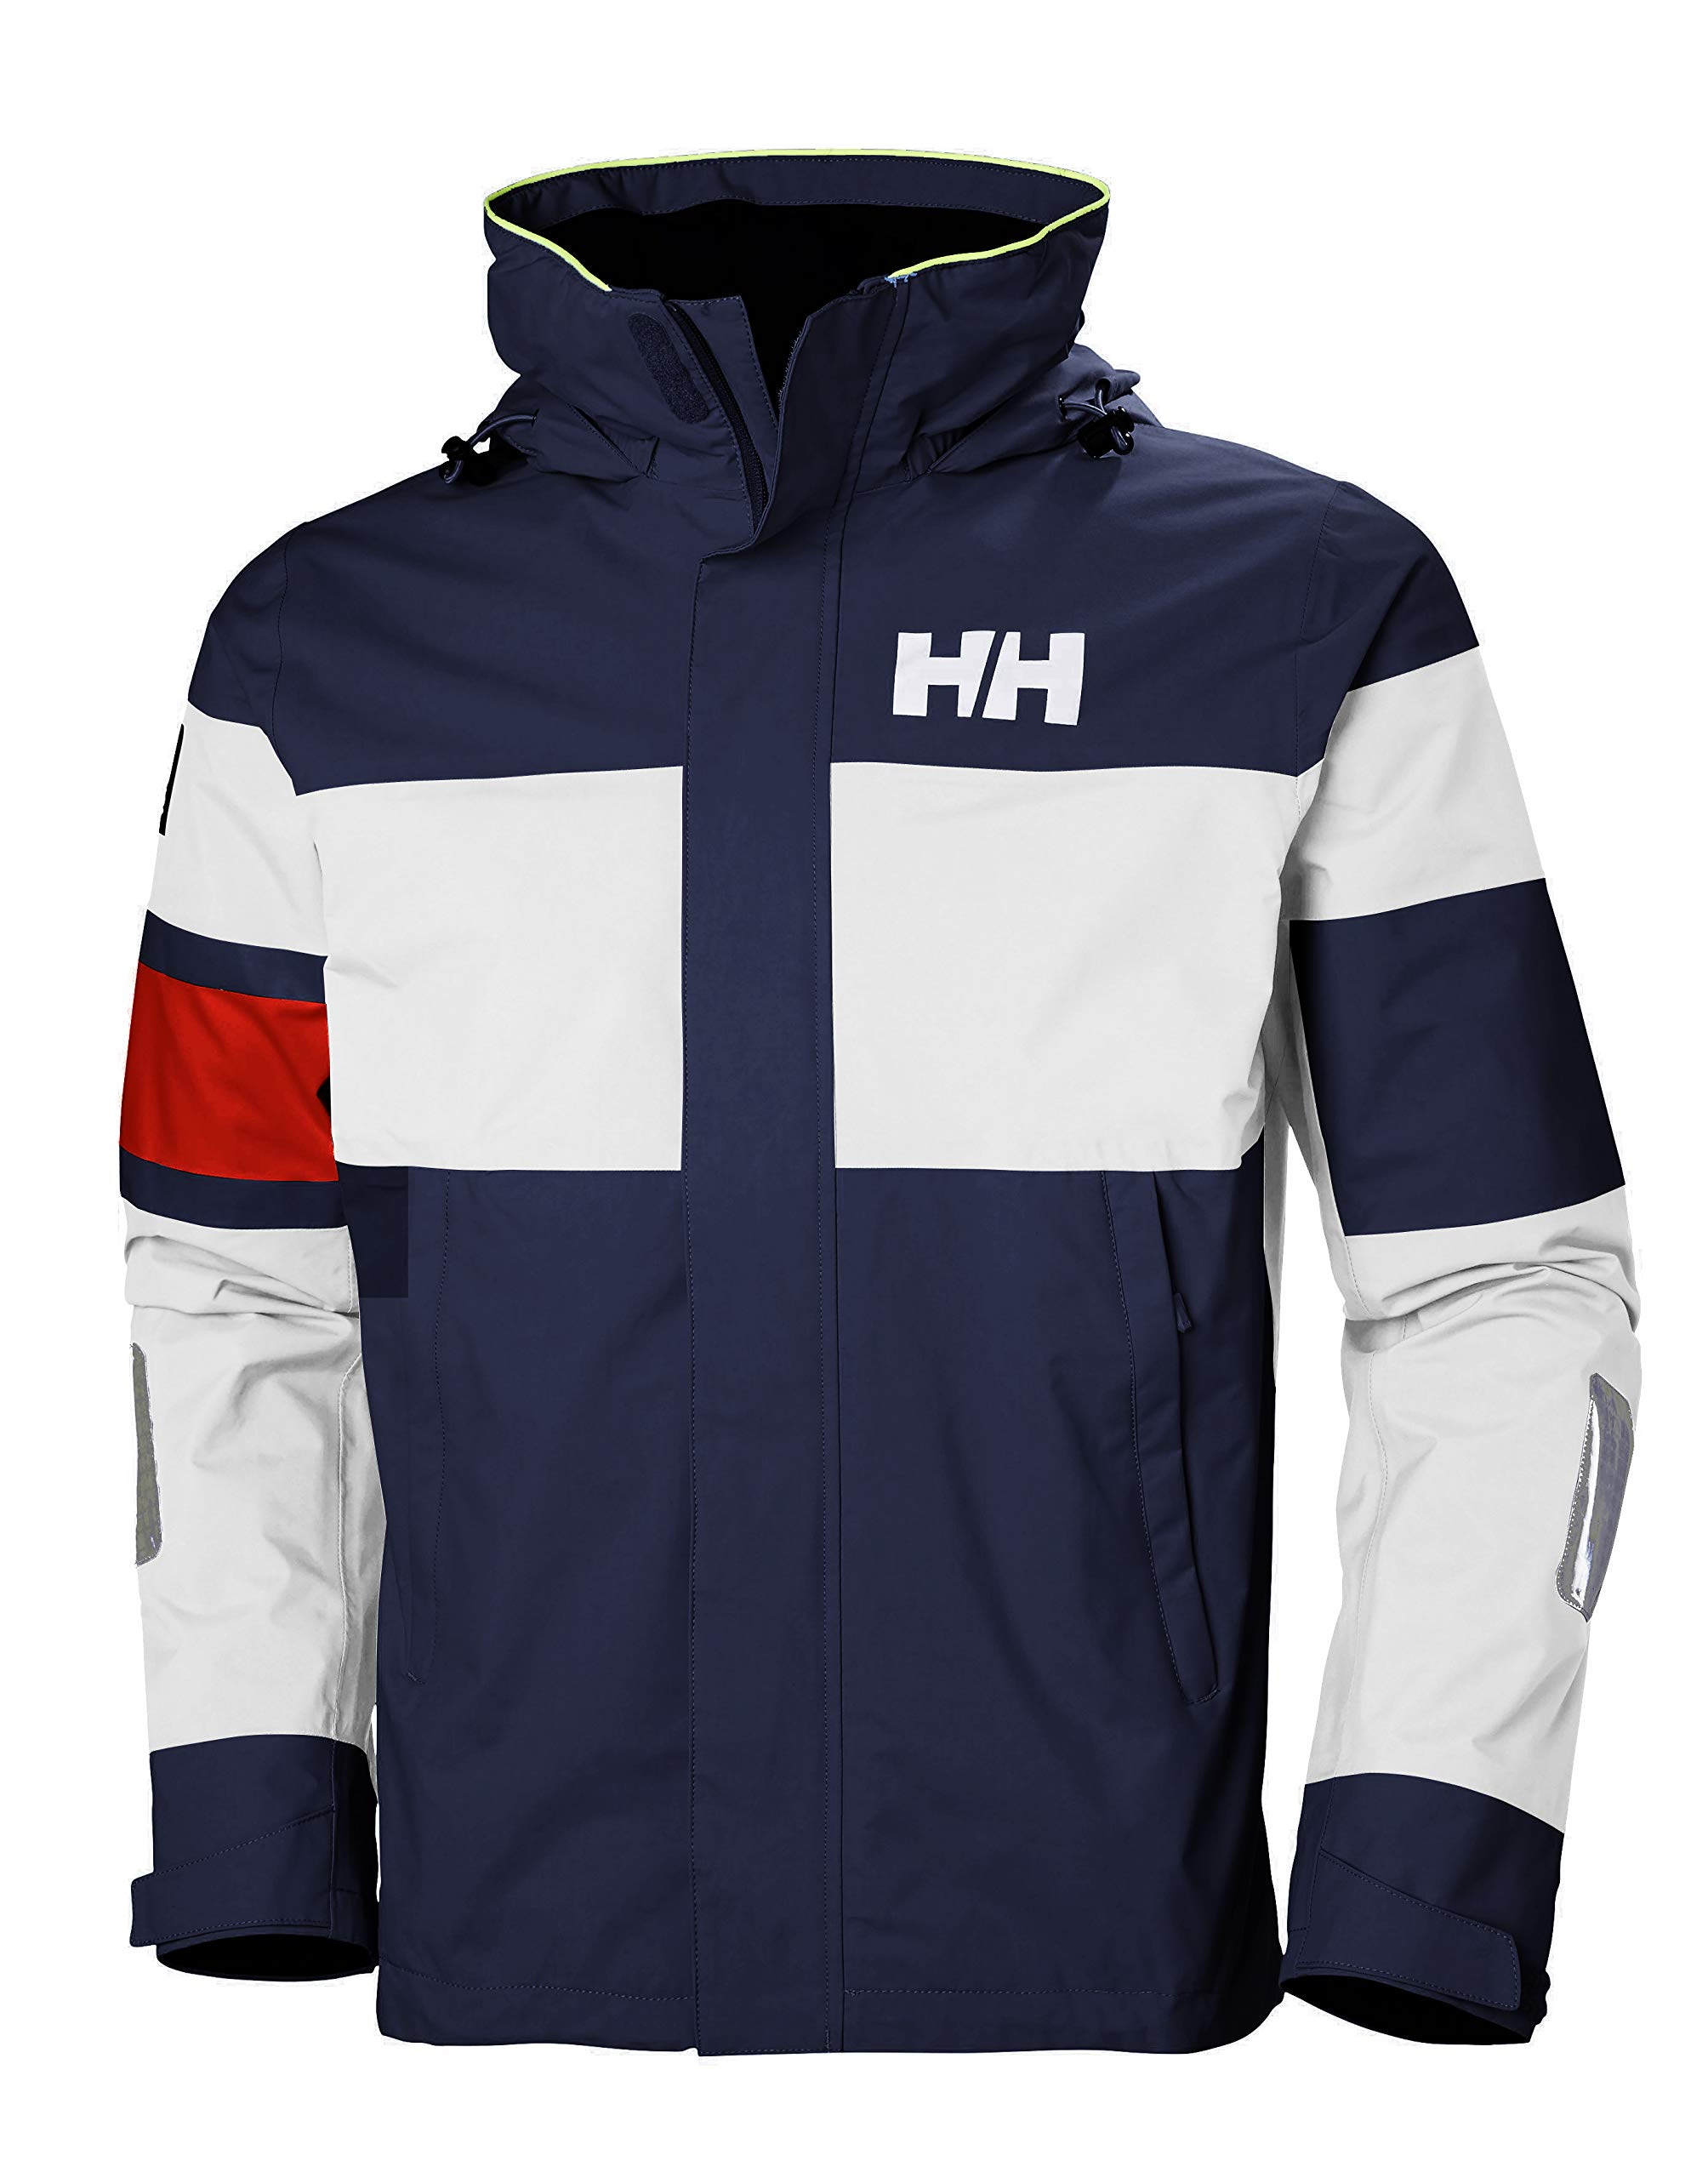 Helly-Hansen Waterproof Salt Light Sailing Jacket